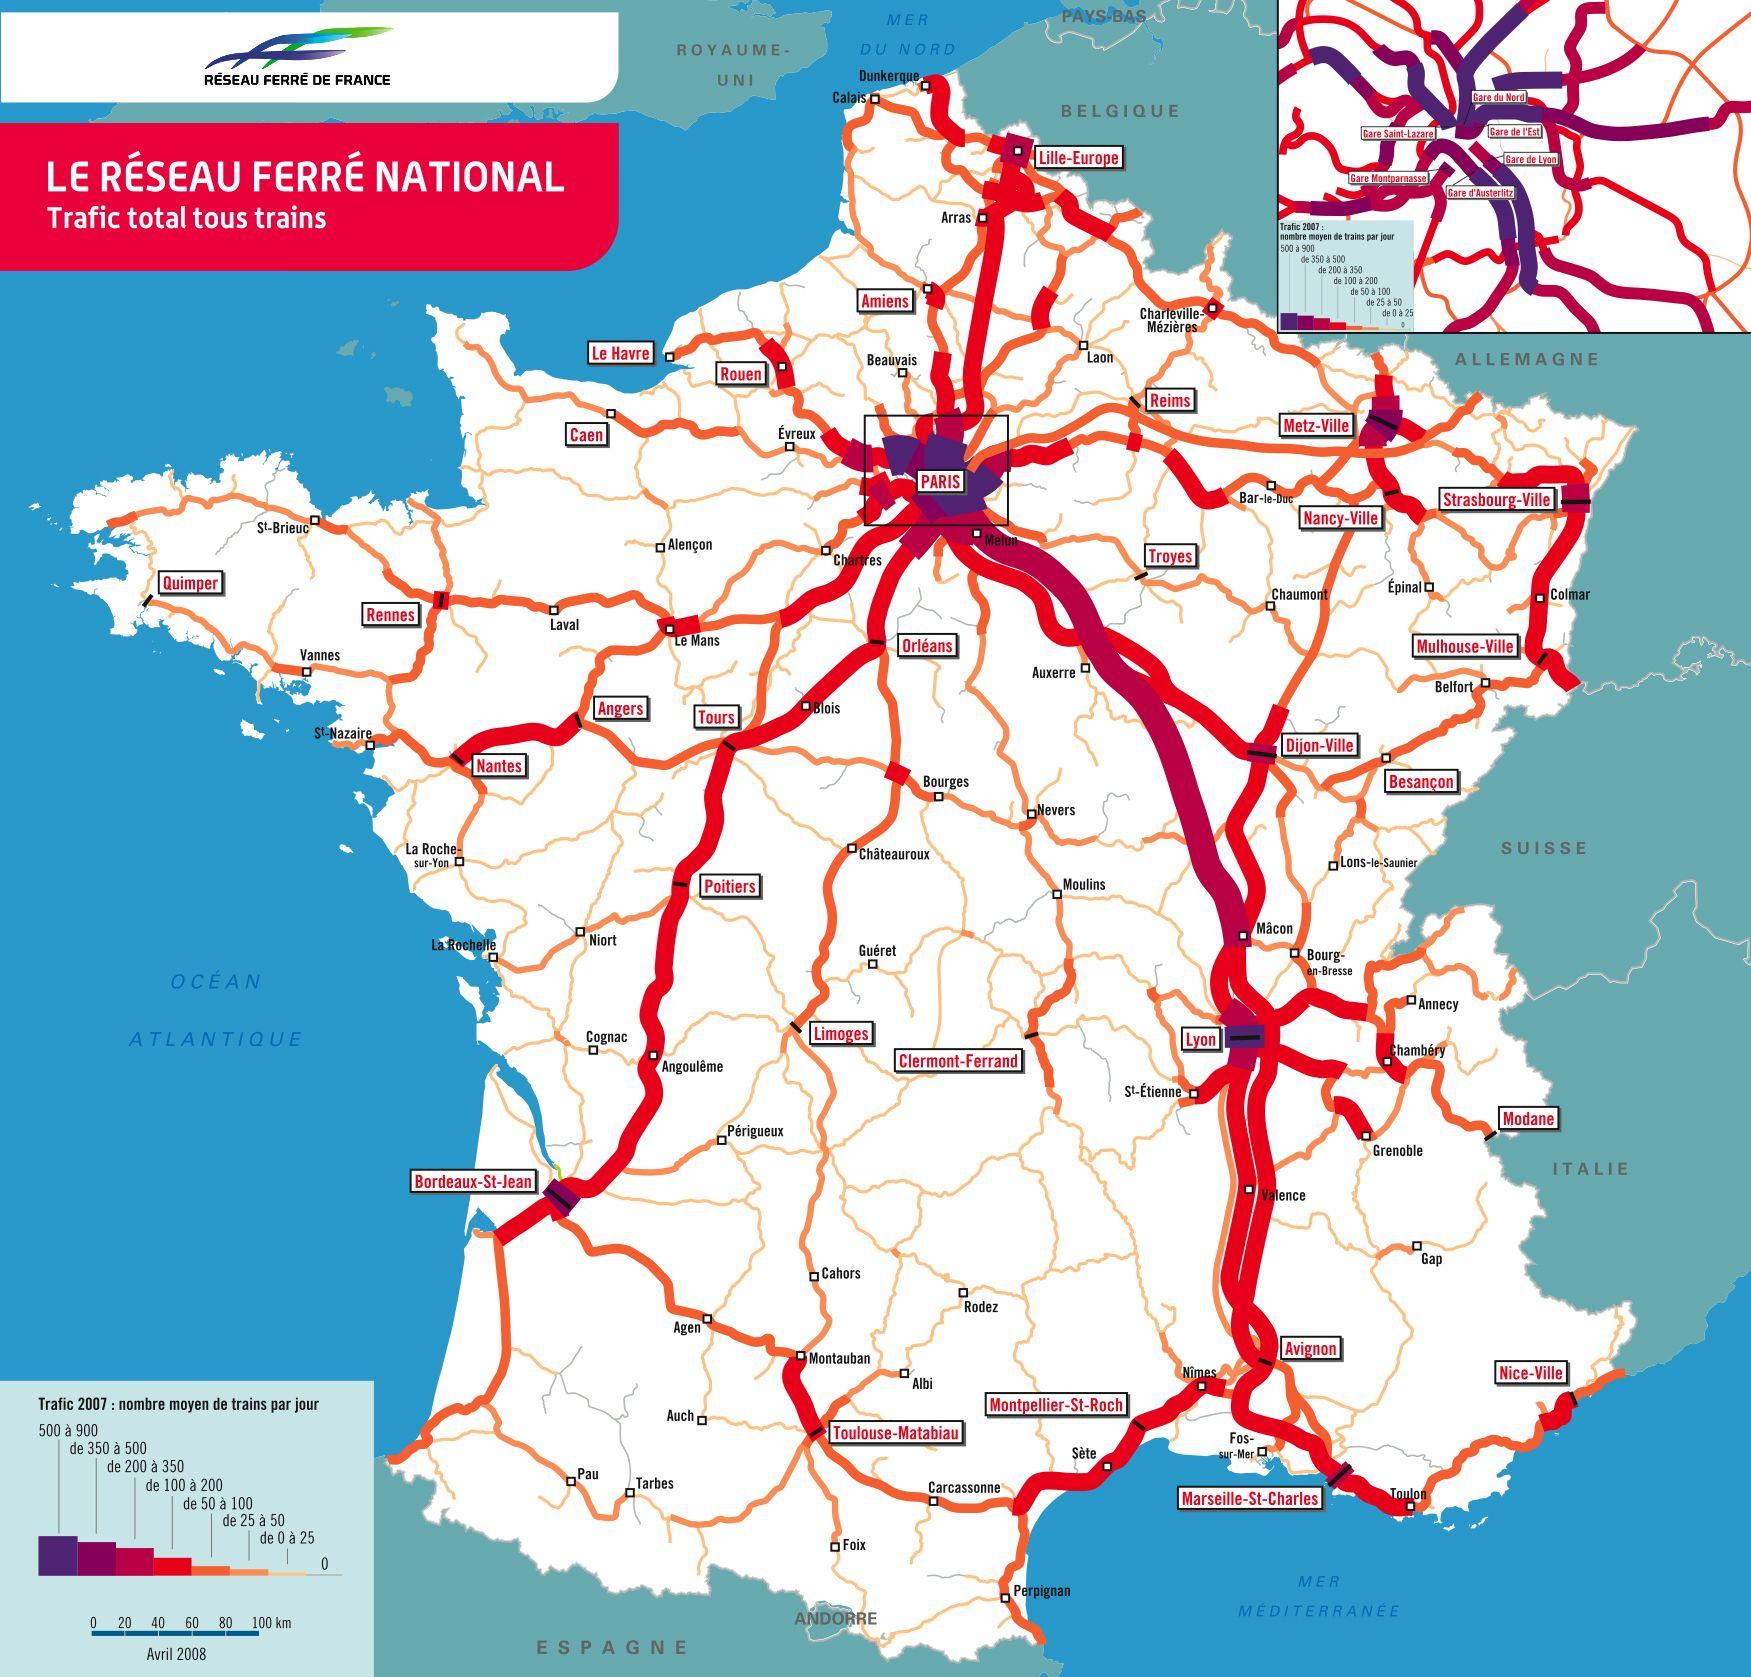 SNCF TGV | Cartography, Map design, Historical maps